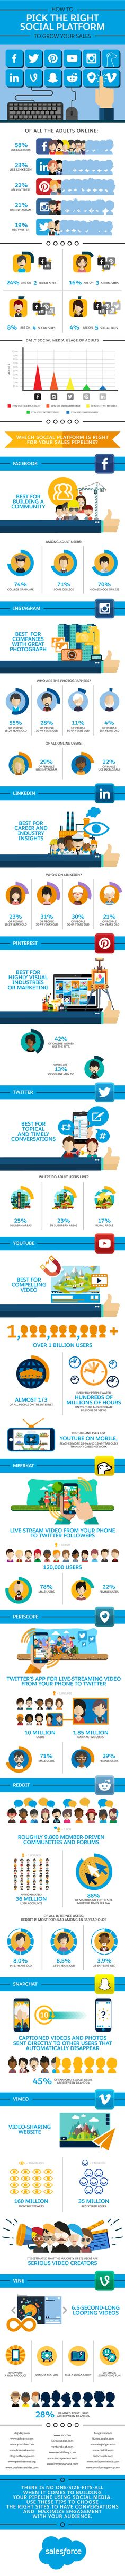 Nasıl Satış [Infographic] Grow Sağ Sosyal Platformlar Pick |  Sosyal Medya Bugün